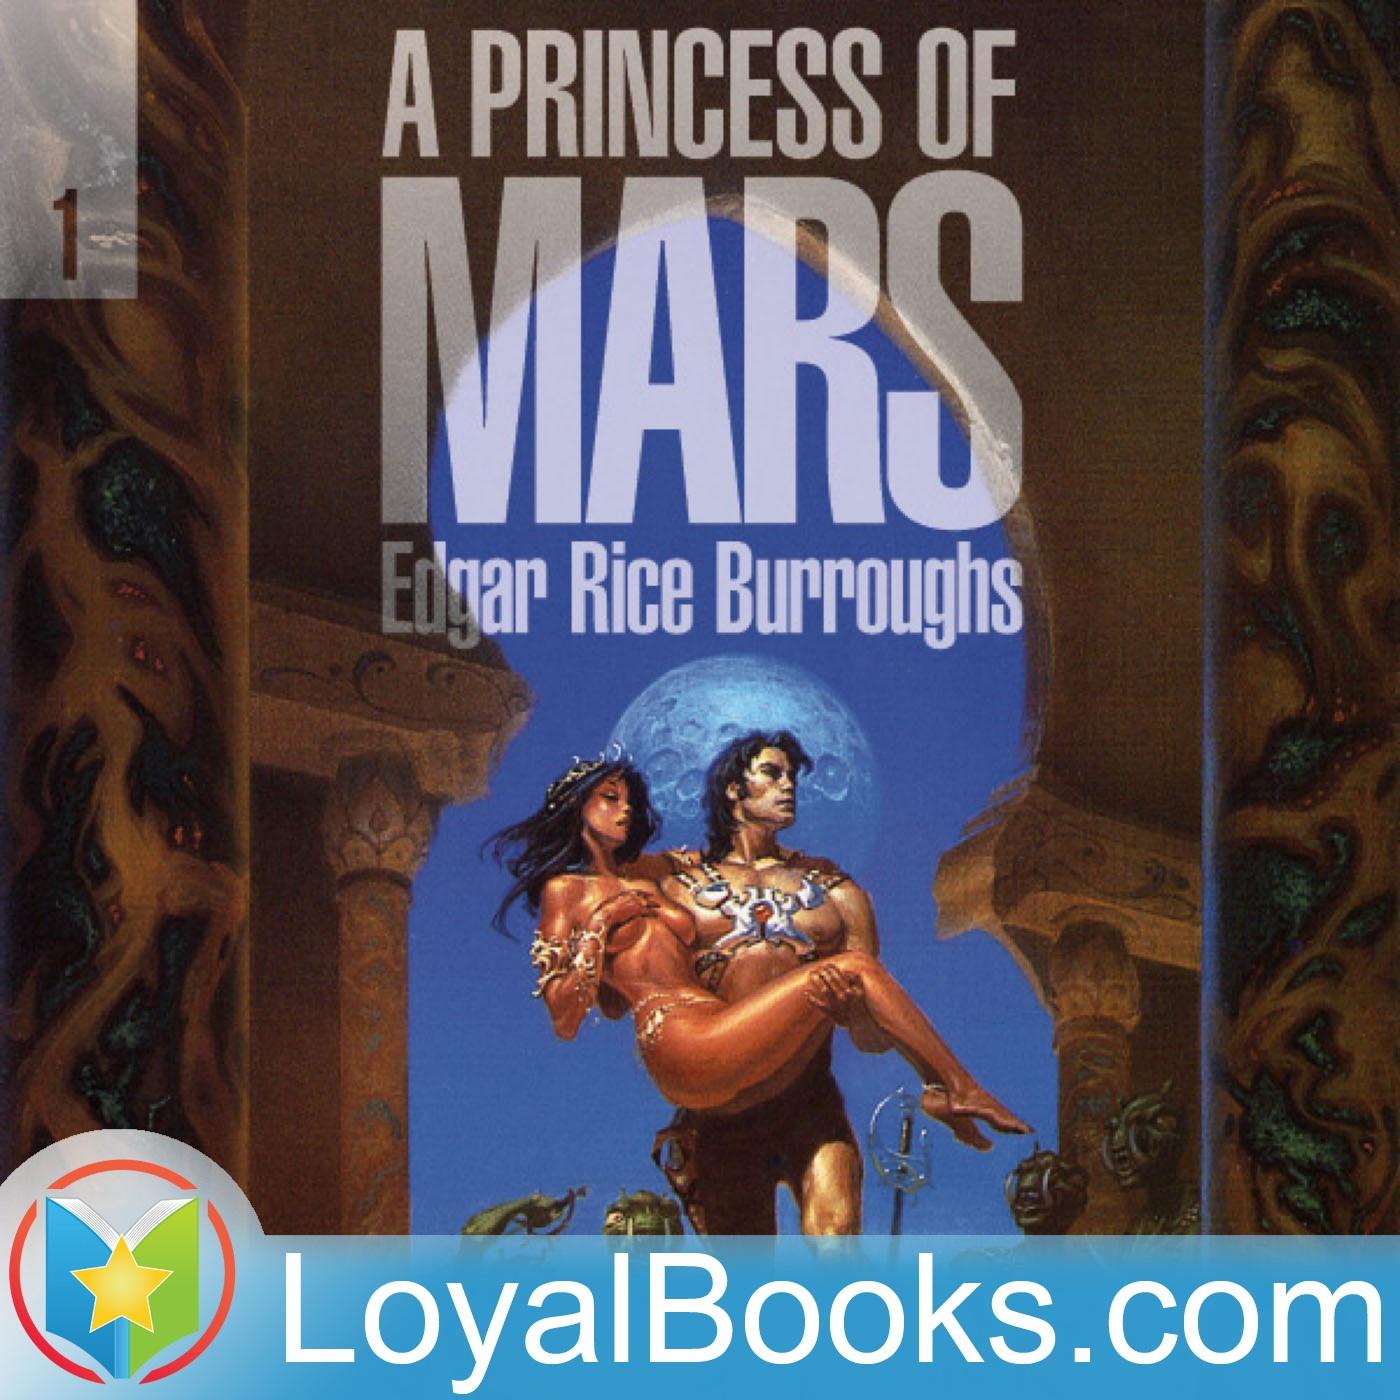 <![CDATA[A Princess of Mars by Edgar Rice Burroughs]]>